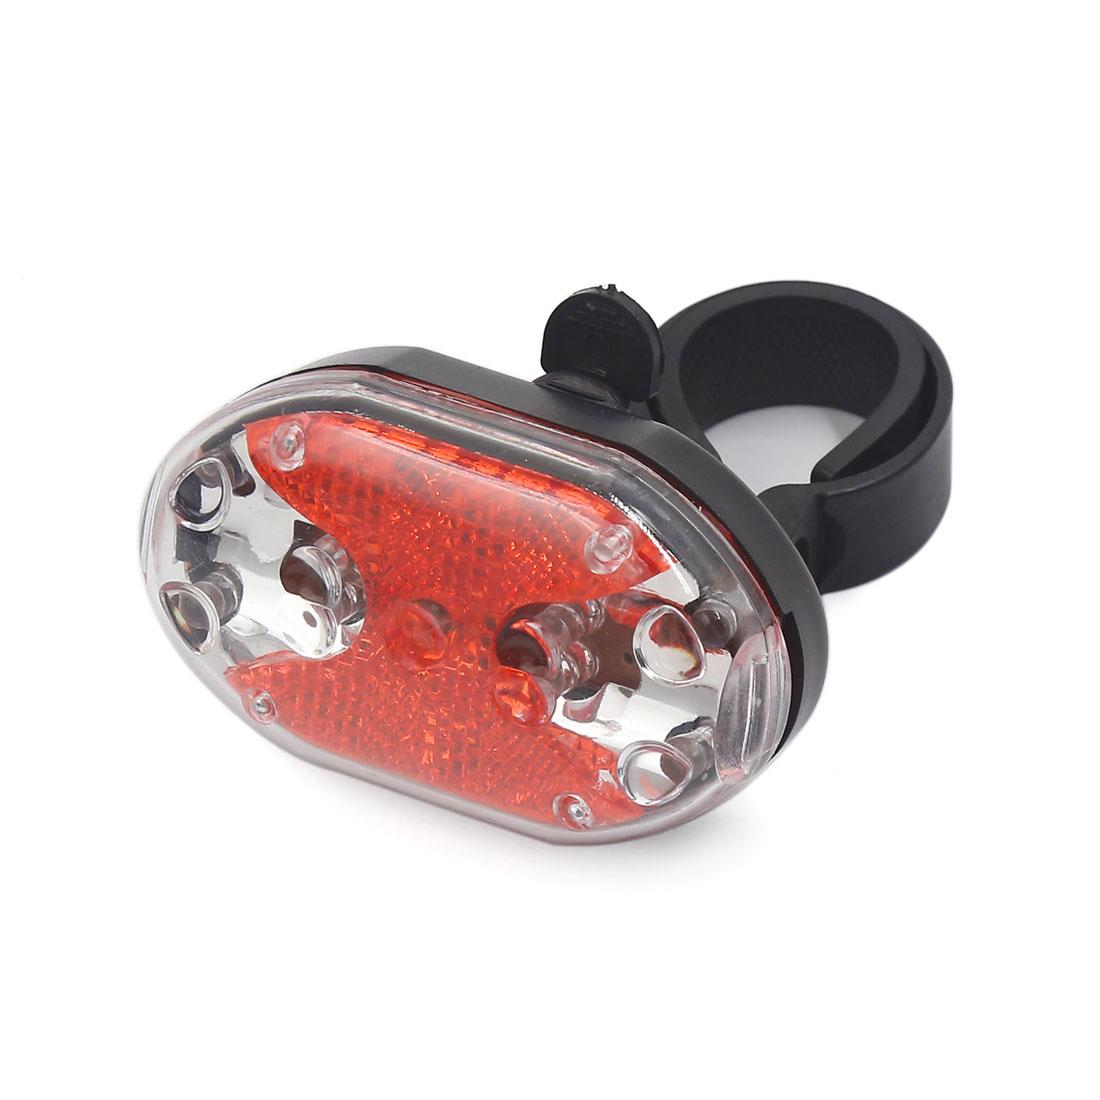 Cycling Bicycle Bike Red 9 LEDs Flashing Rear Warning Safety Tail Light Lamp